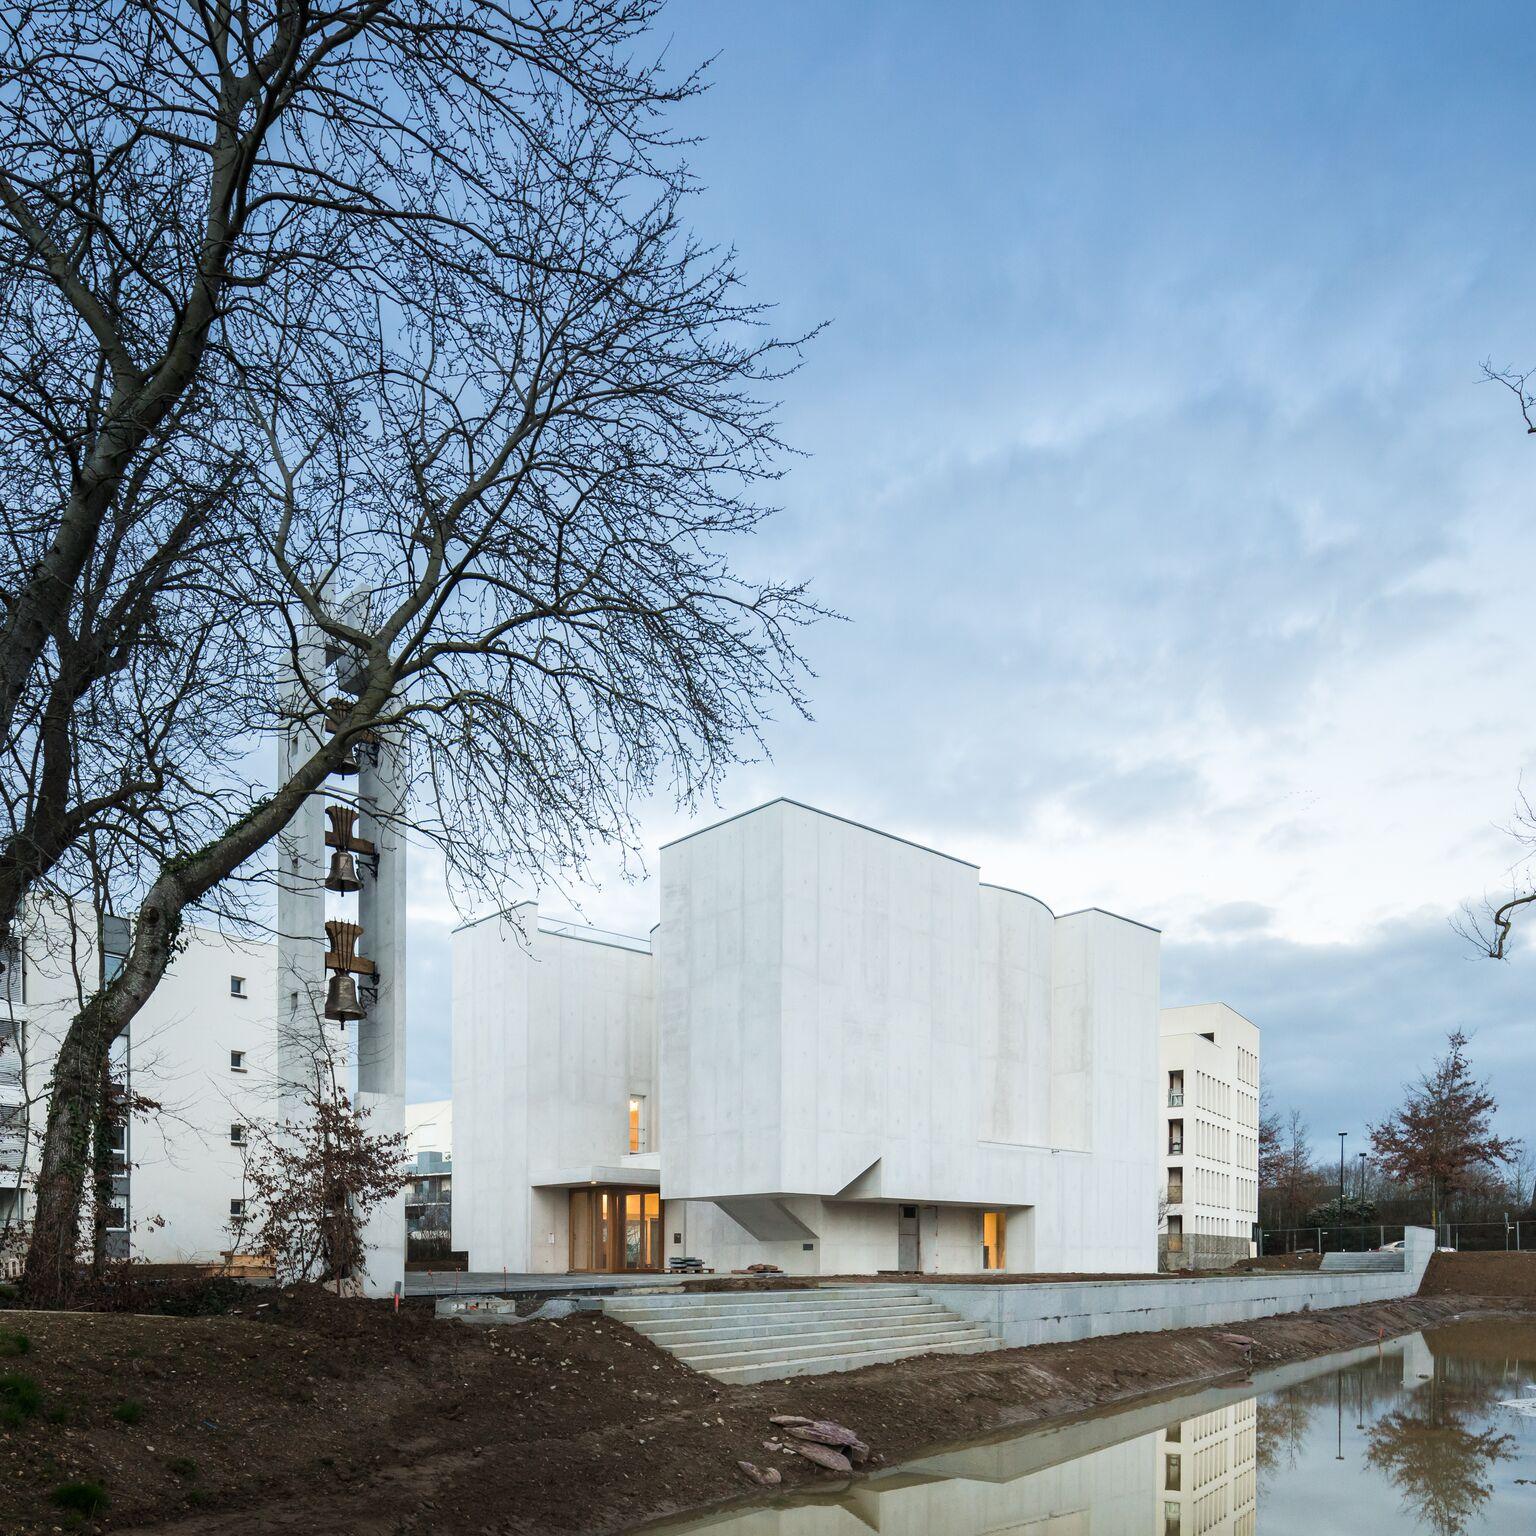 1_Alvaro Siza Vieira_New Church of Saint-Jacques de la Lande_Inspirationist